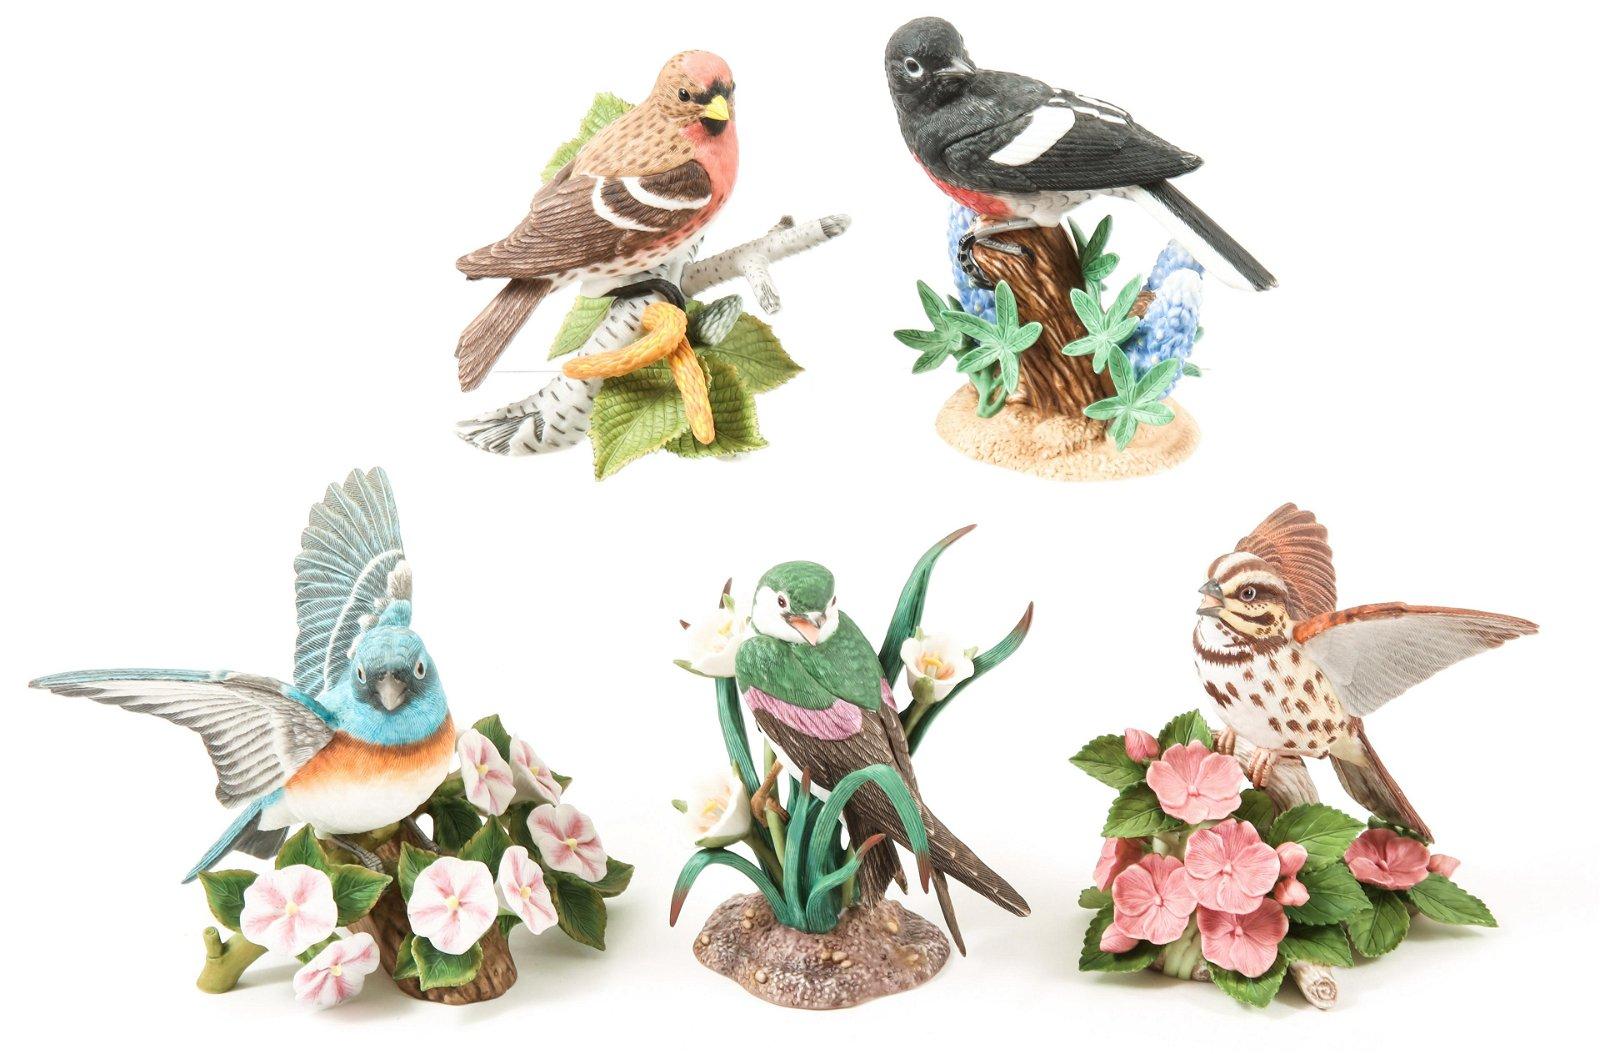 LENOX PORCELAIN BIRD FIGURINES - LOT OF 5